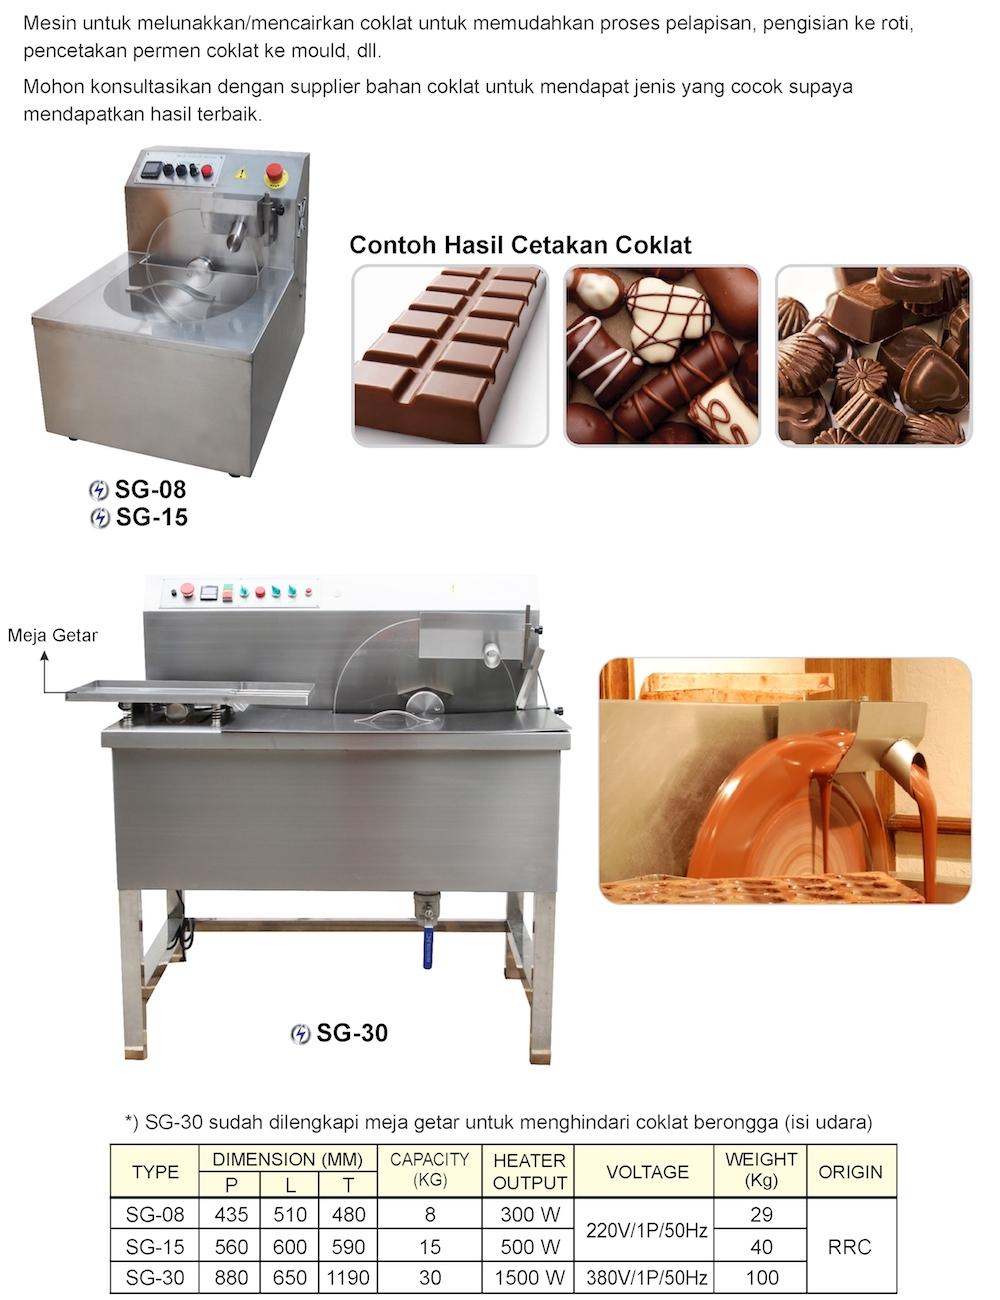 Broshur Mesin Tempering Coklat | Mesin Pencair & Pelunak Coklat